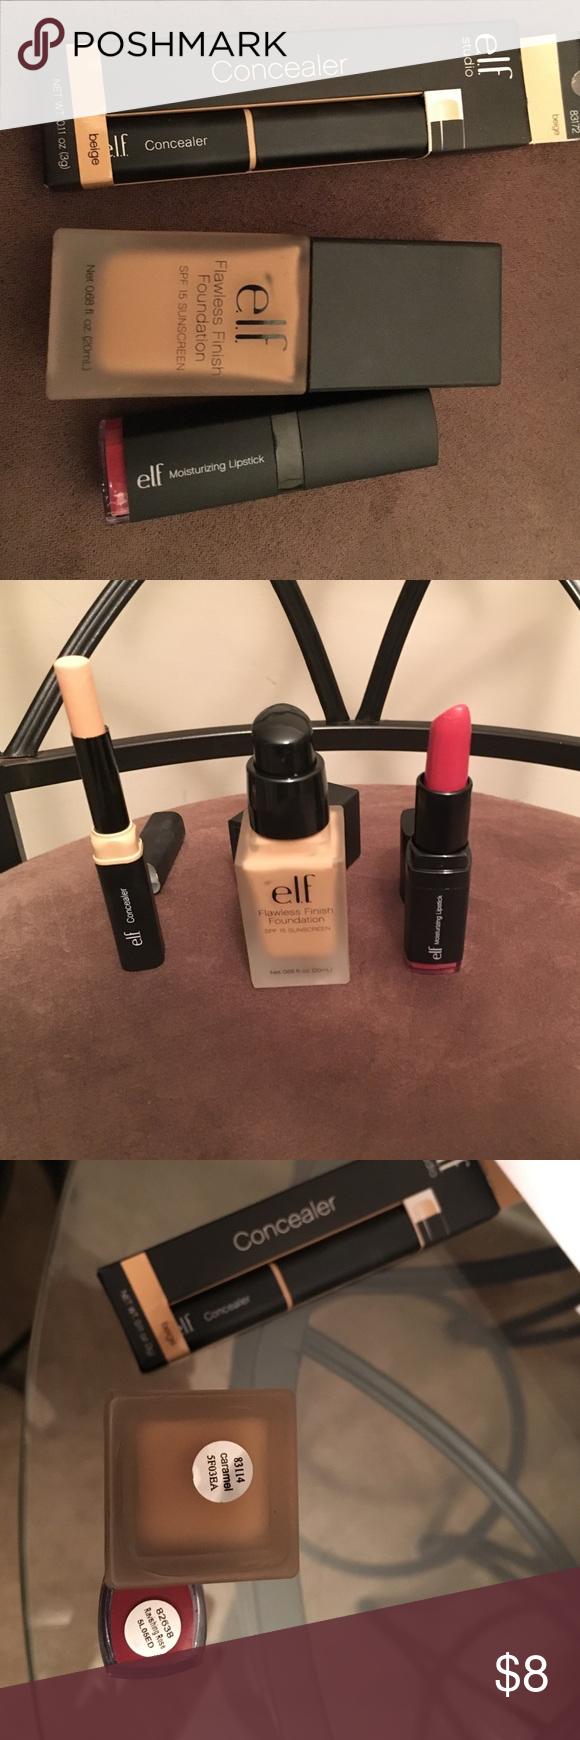 e.l.f foundation,concealer & moisturizing lip💄NEW